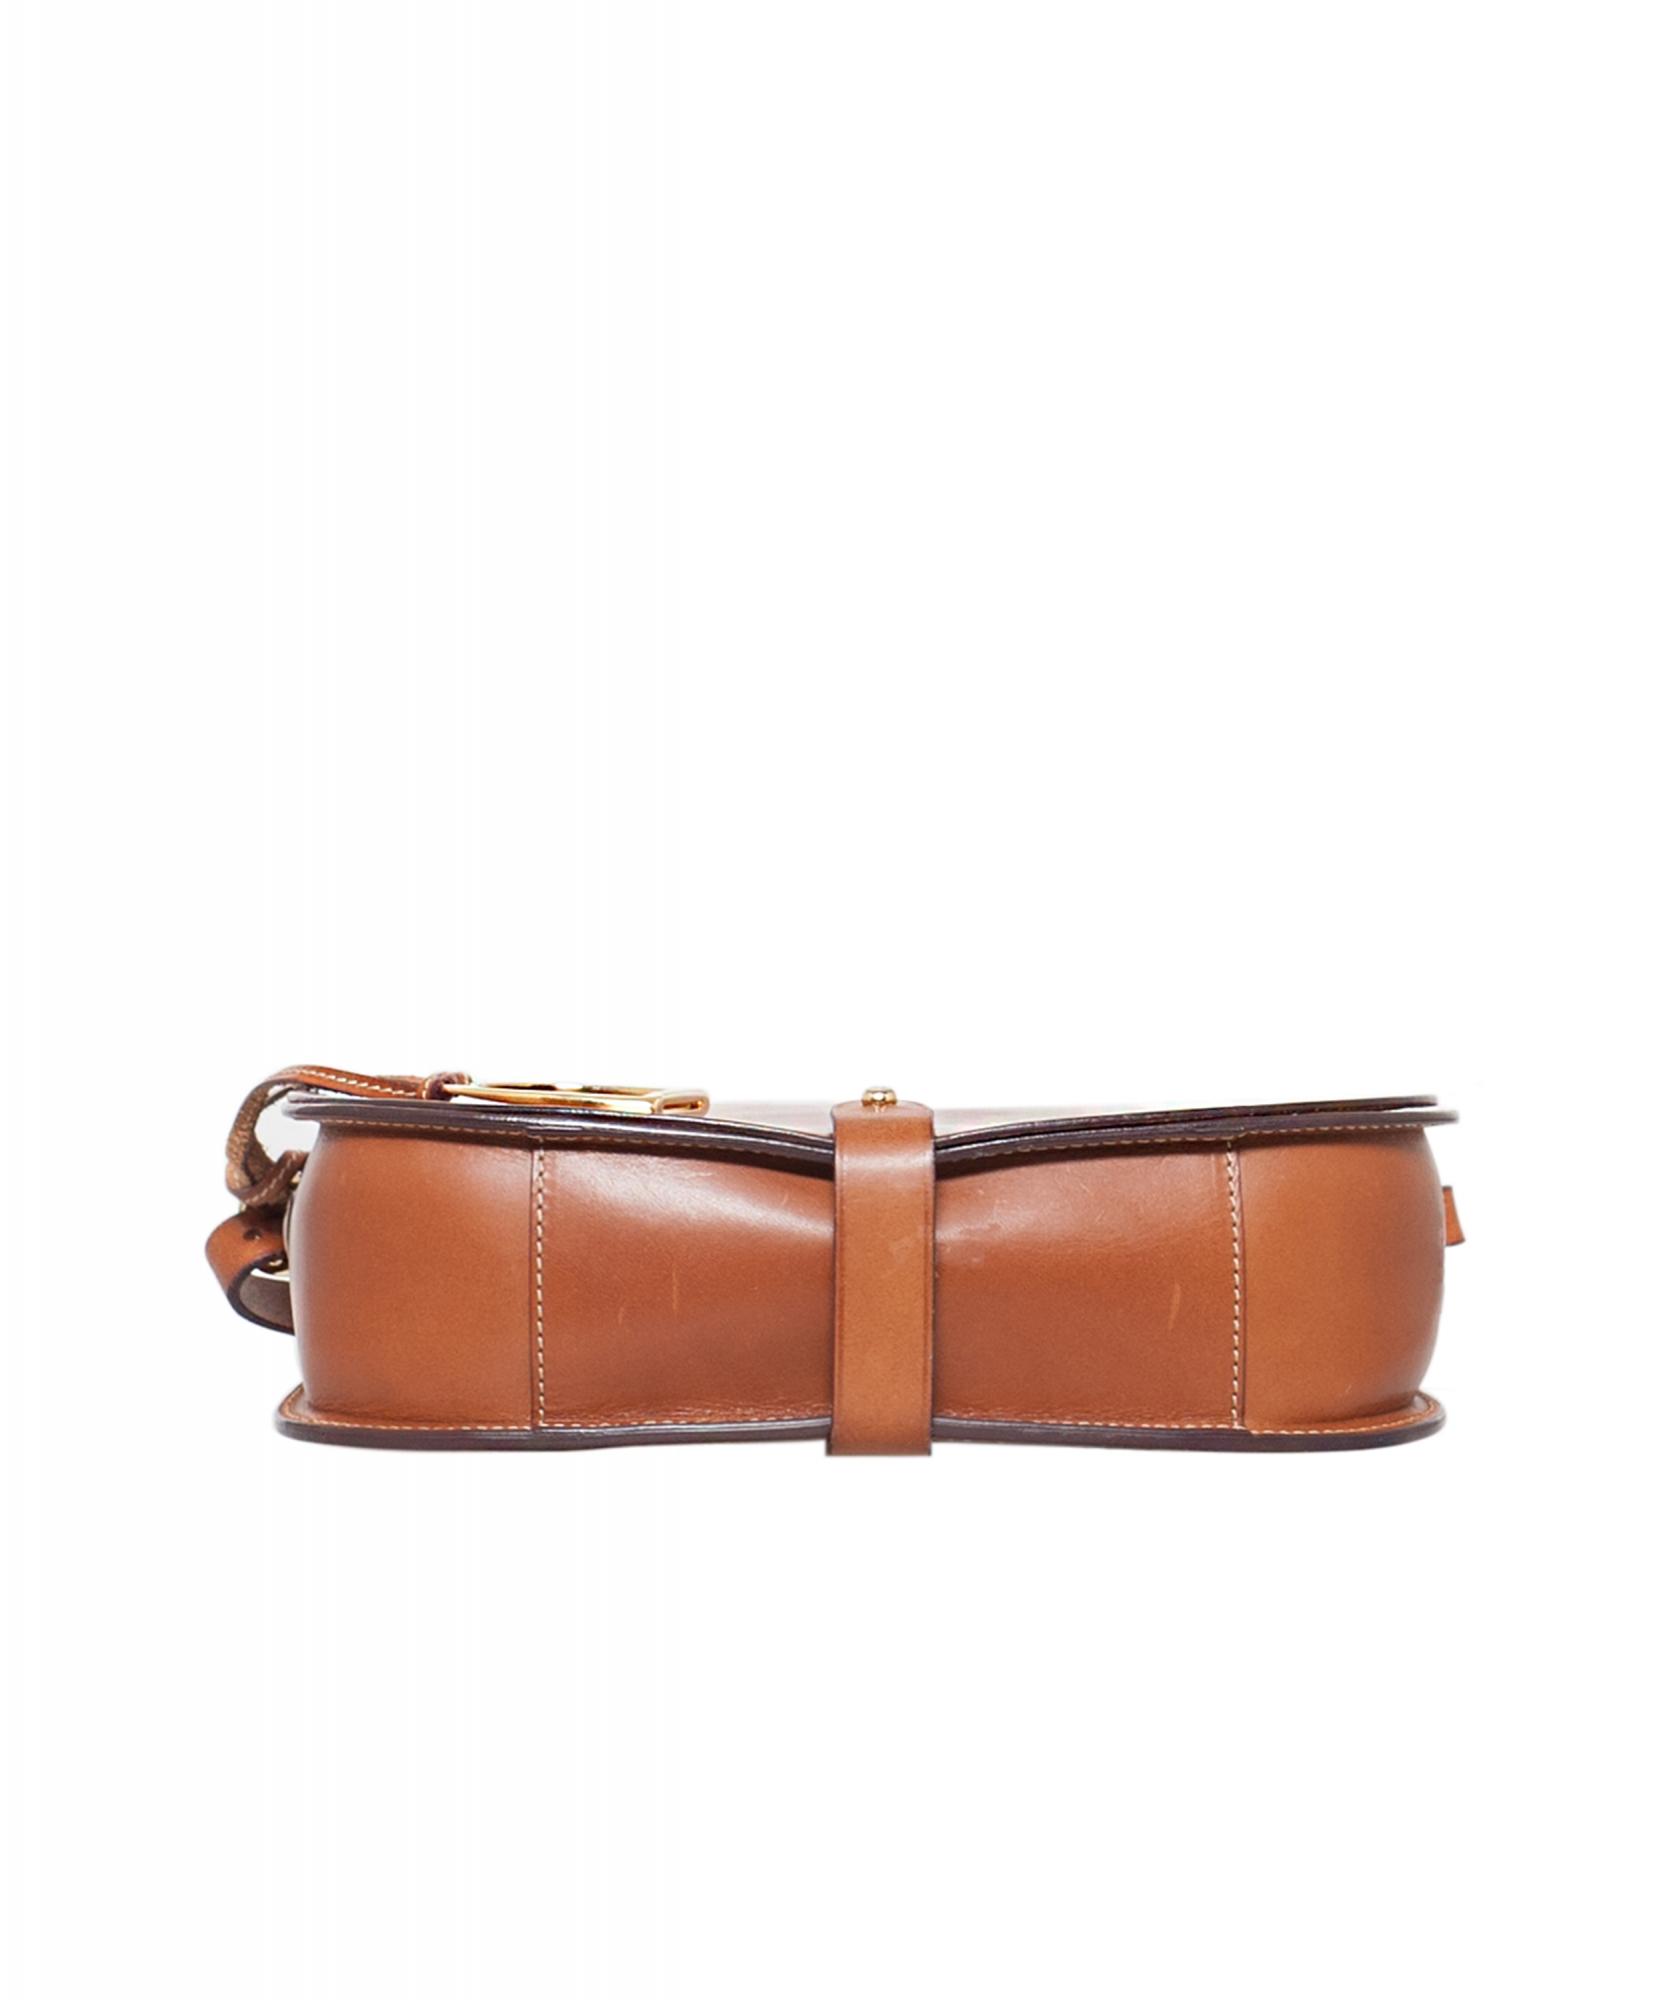 ... Shoulder Bags  Ralph Lauren Equestrian Vachetta Saddle Bag. Tap to  expand 7008cb6525